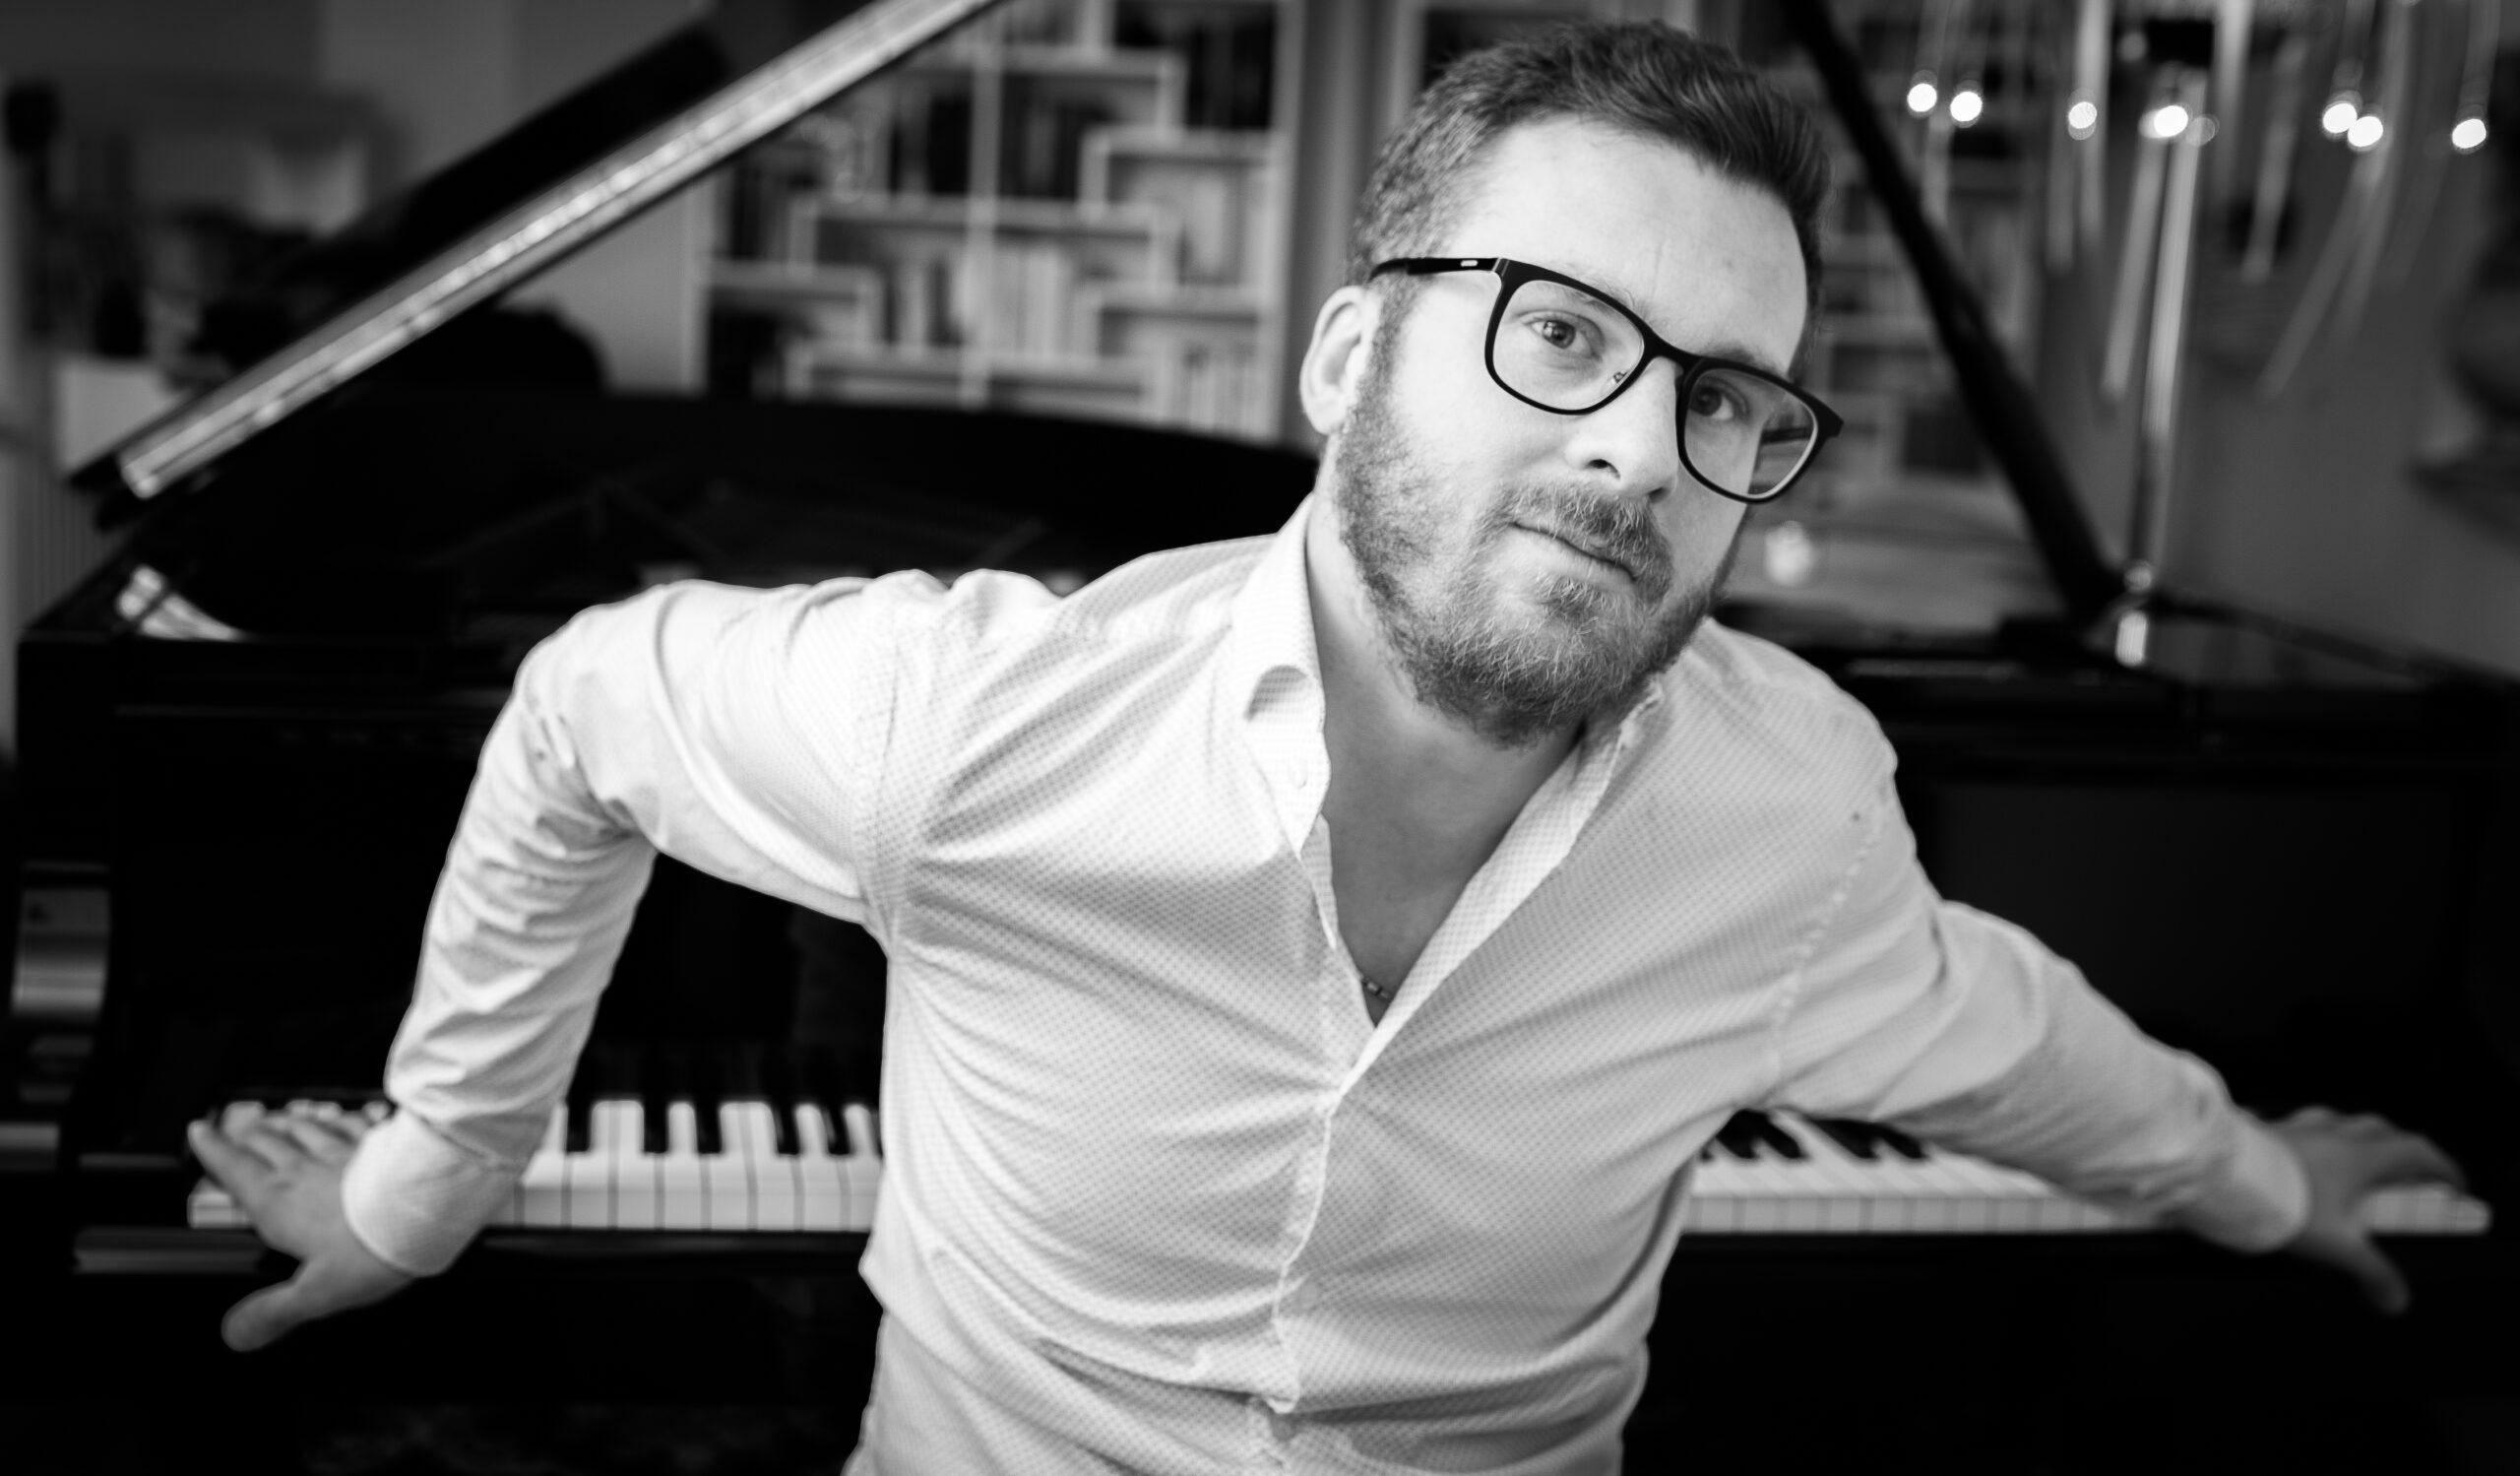 Sonntag, 11.04.21 / 20.15 Uhr – Luis Berra – Piano( Blues – Jazz ). Livestream über: https://youtu.be/a22O2DKHiDE